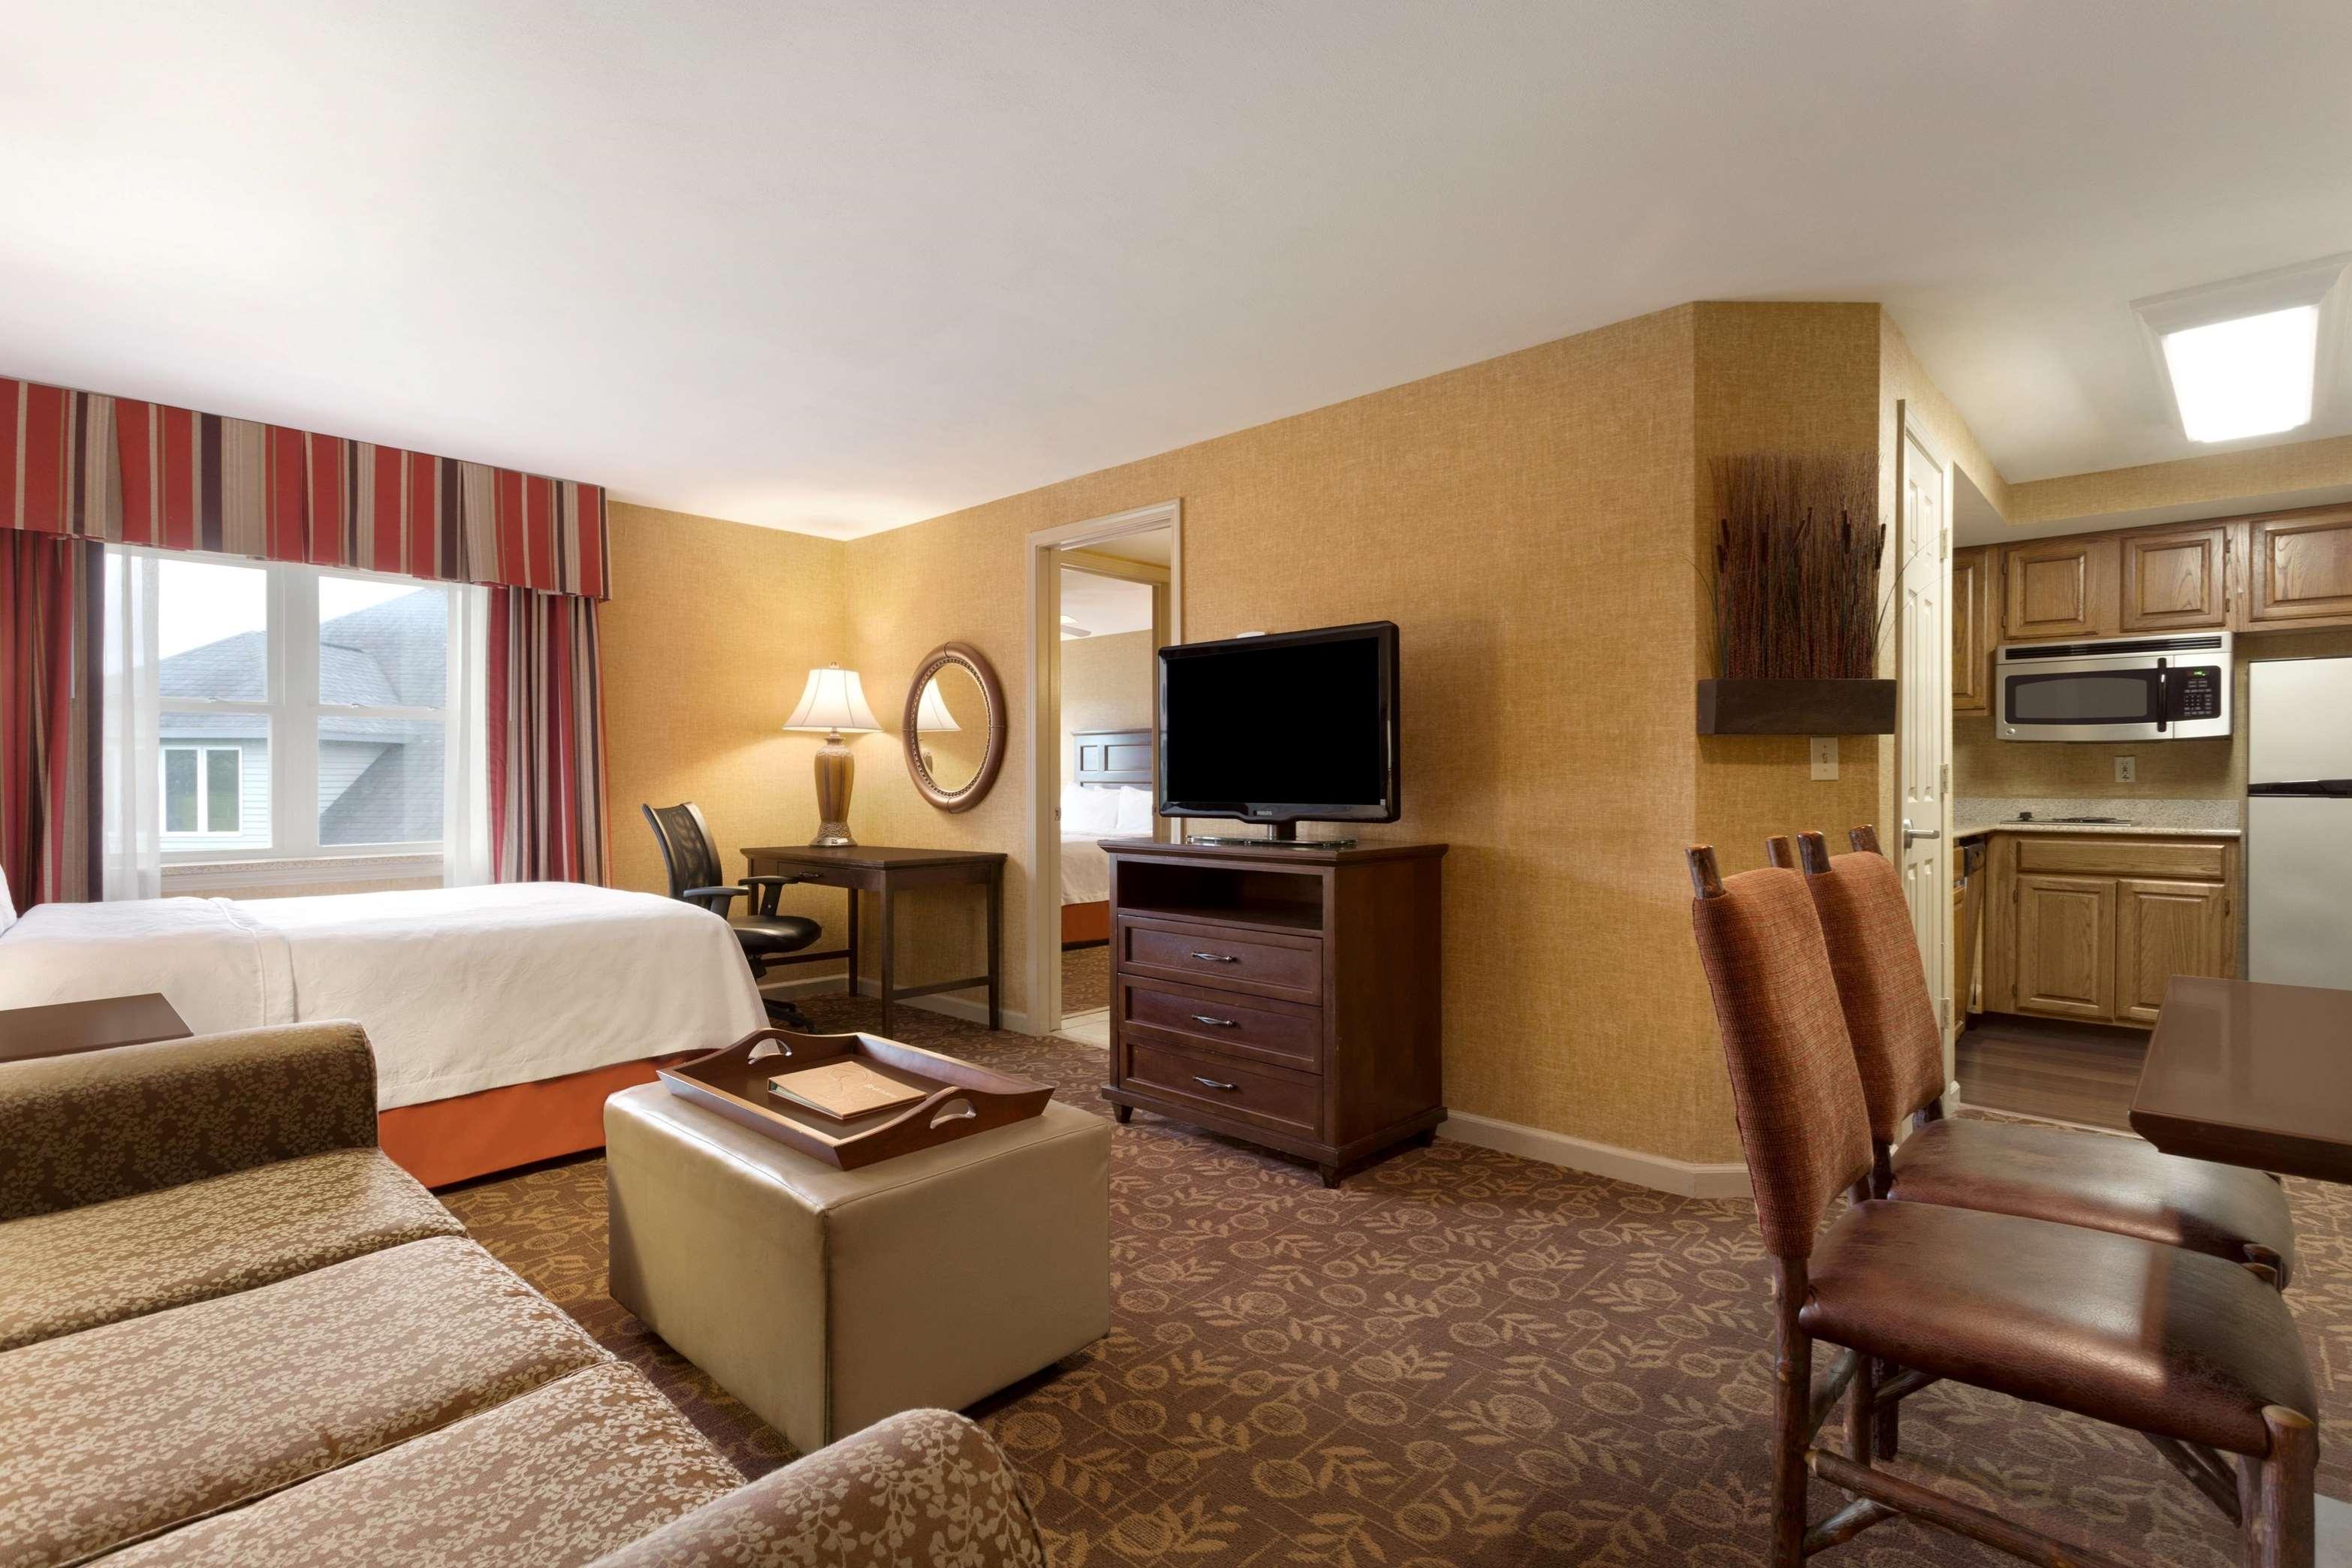 Homewood Suites by Hilton Syracuse/Liverpool image 21